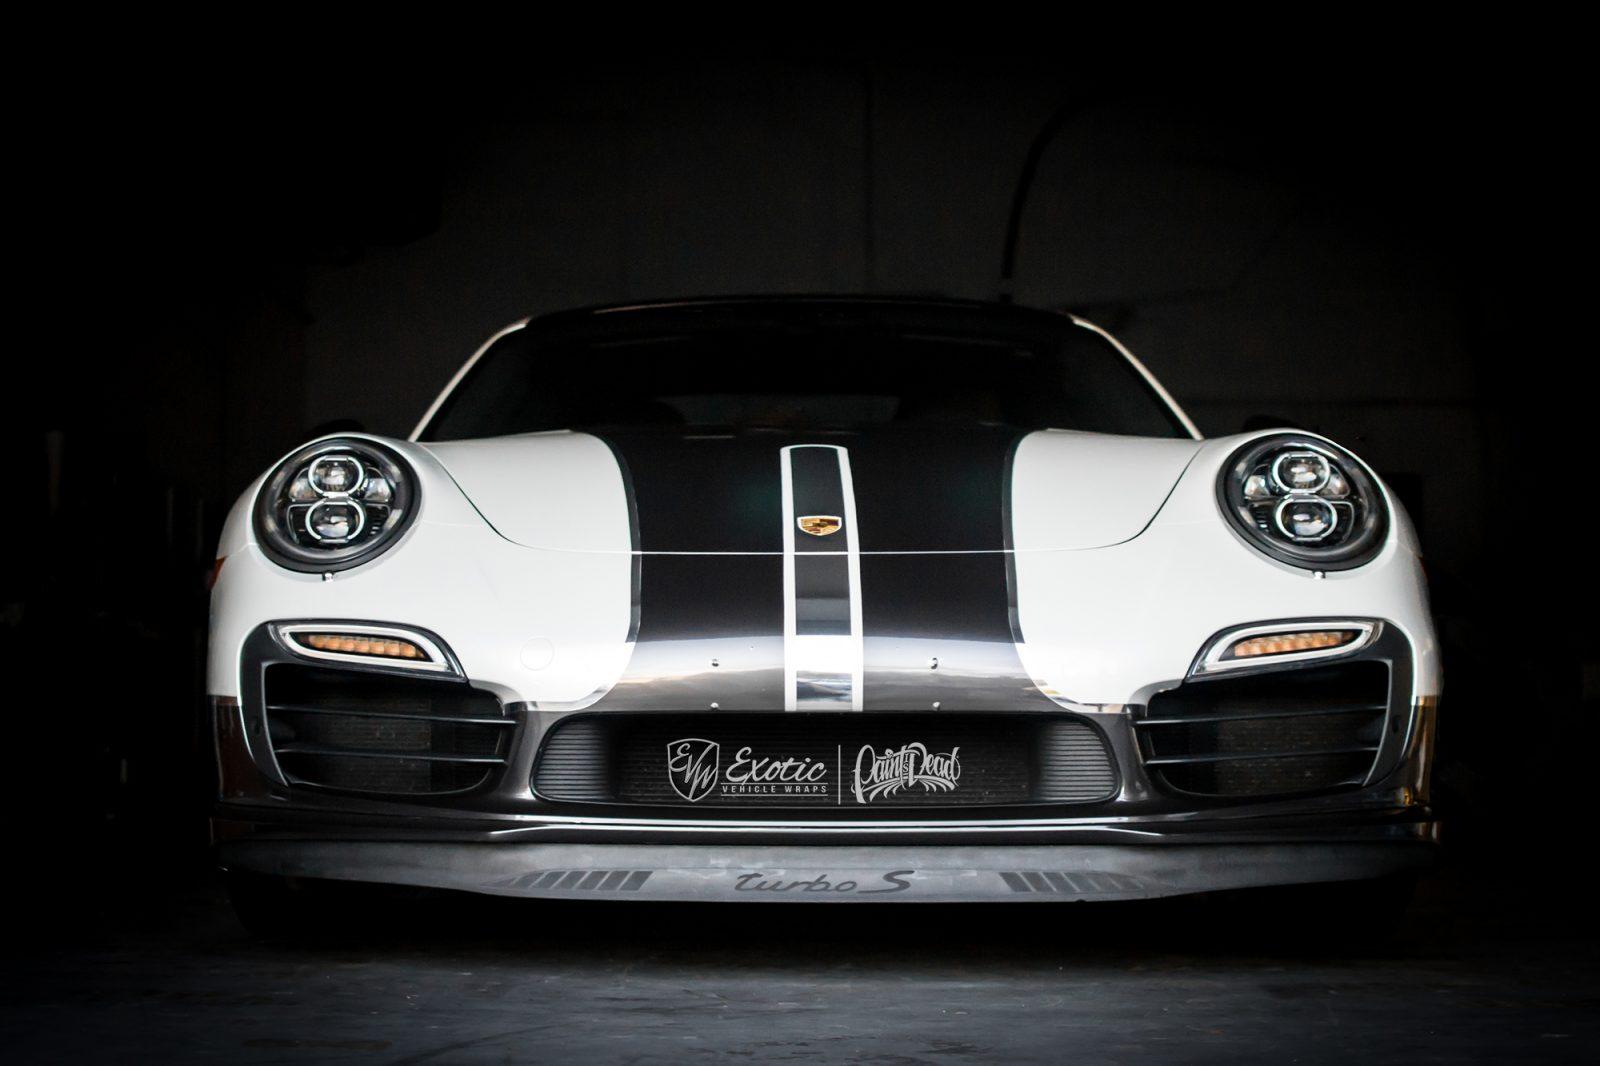 Porsche Tysons Corner >> Vehicle Wraps, Paint Protection, Vehicle Customs Installations